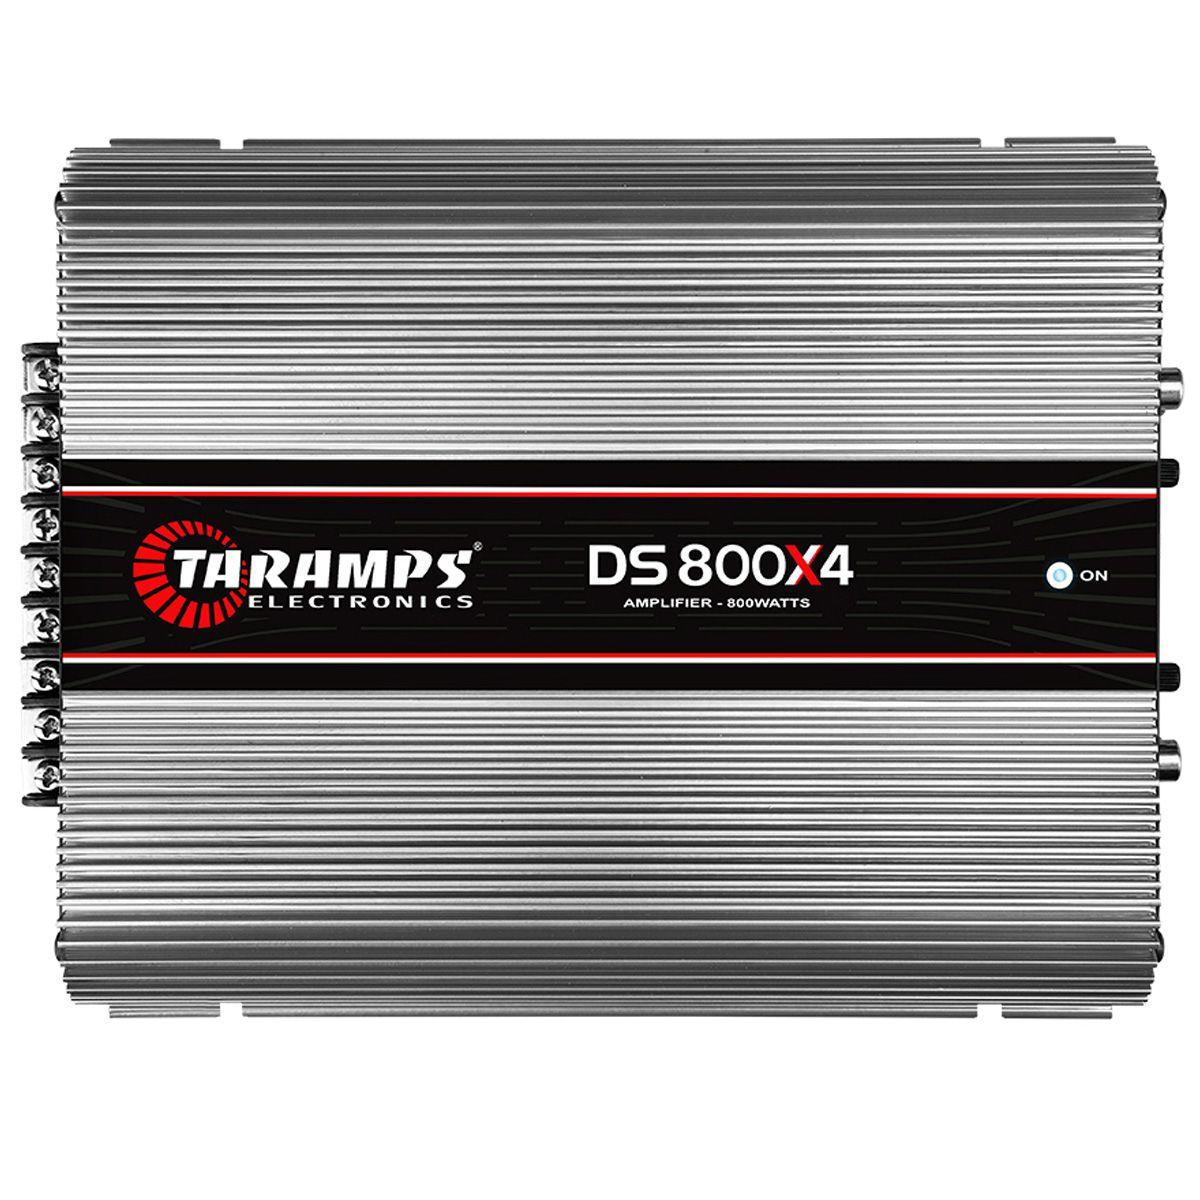 Módulo Amplificador Ds 800x4 Taramps 800w Rms 2 Ohms 4 Canais